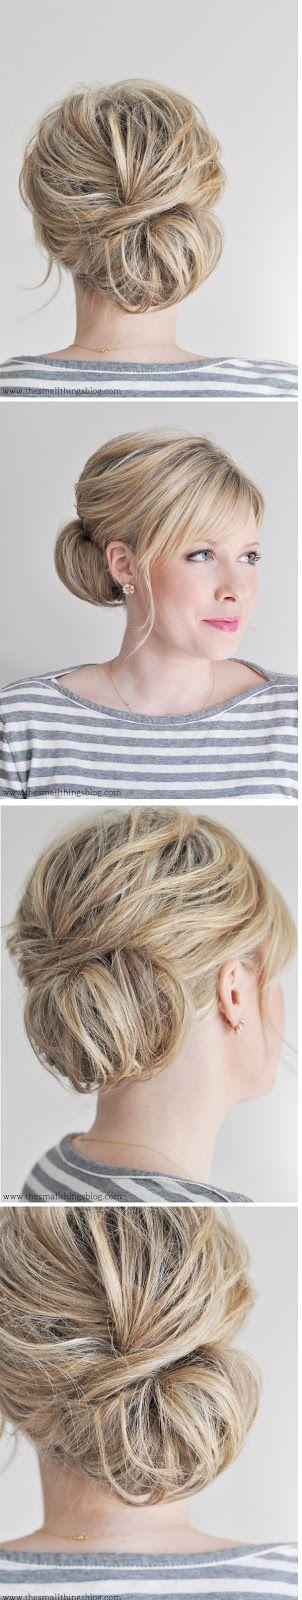 Low Chignon Hair Tutorial